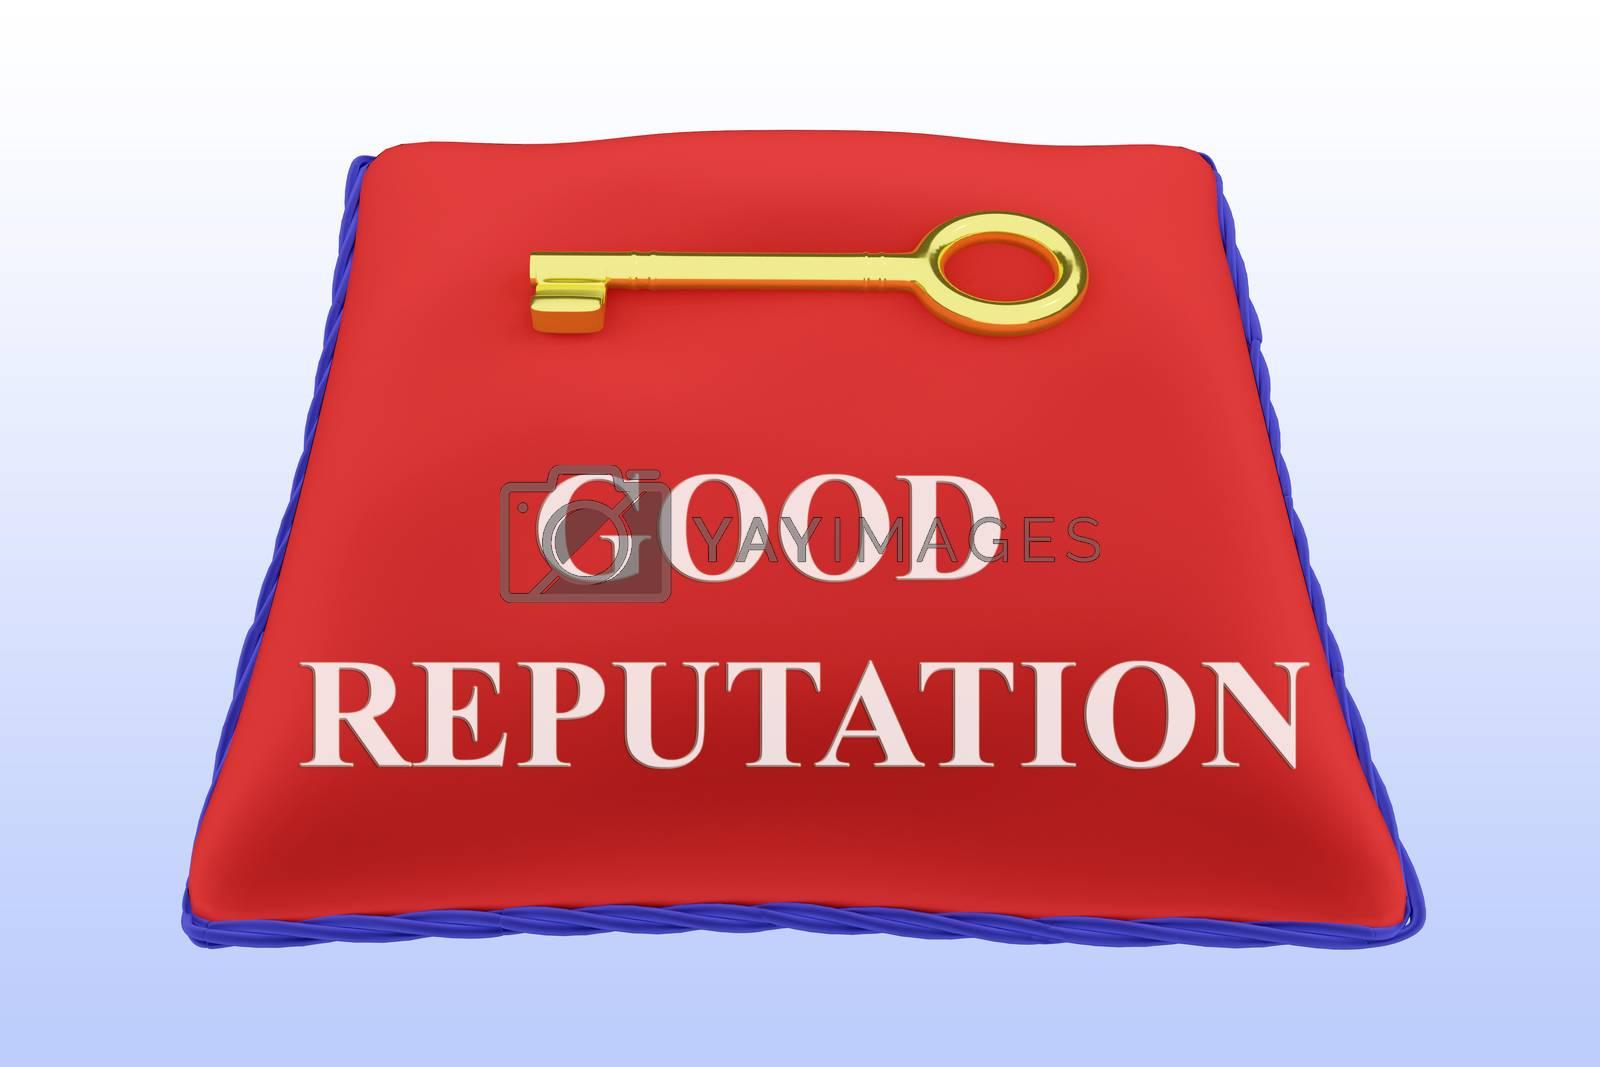 Render illustration of GOOD REPUTATION Title on red velvet pillow vear a golden key, isolated over blue gradient.